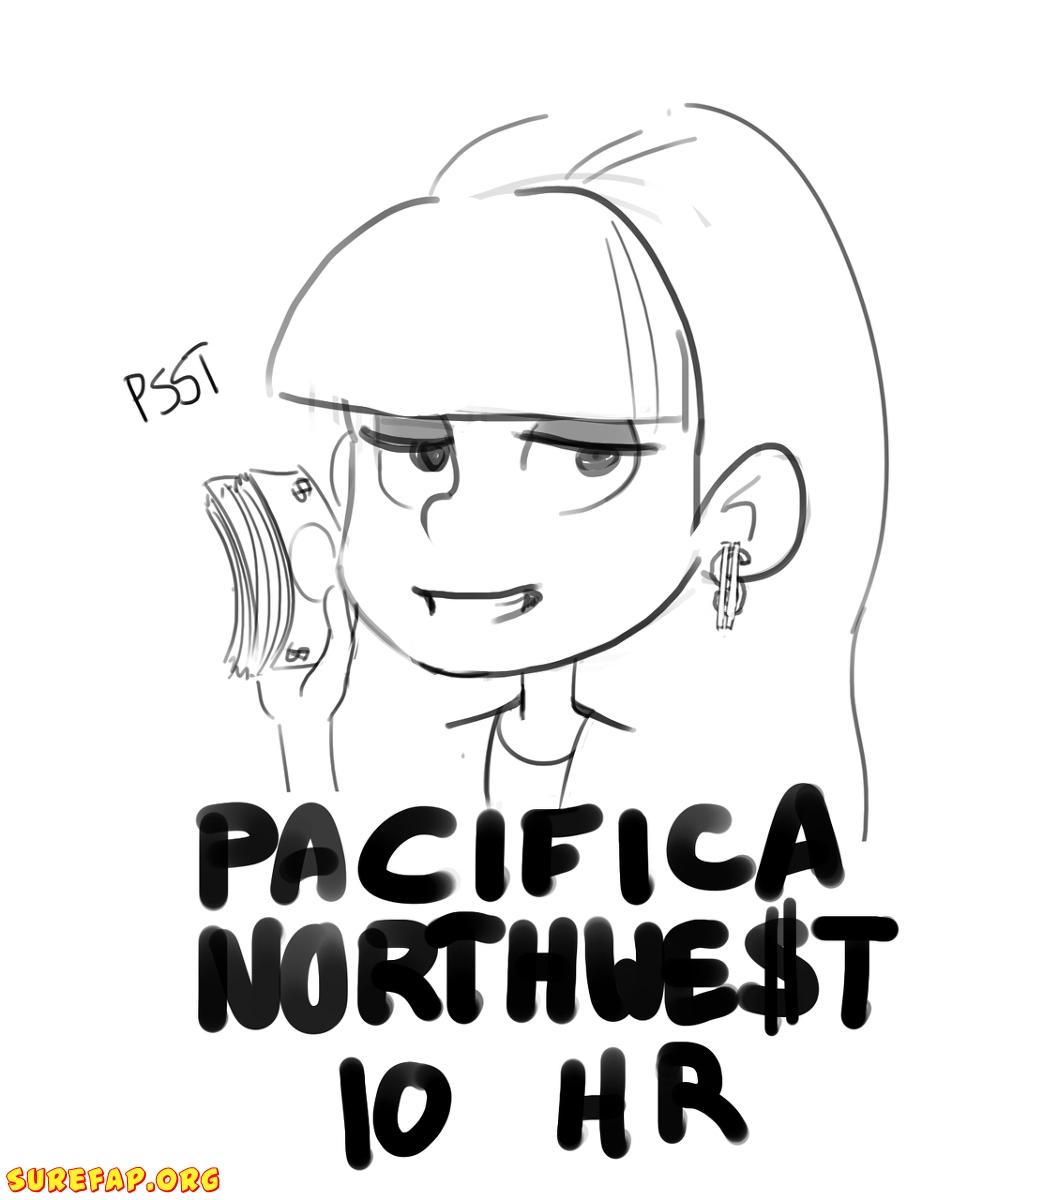 surefap.org__Pacifica-Northwest-10-HR-00_Gotofap_968916087_2476478324.jpg